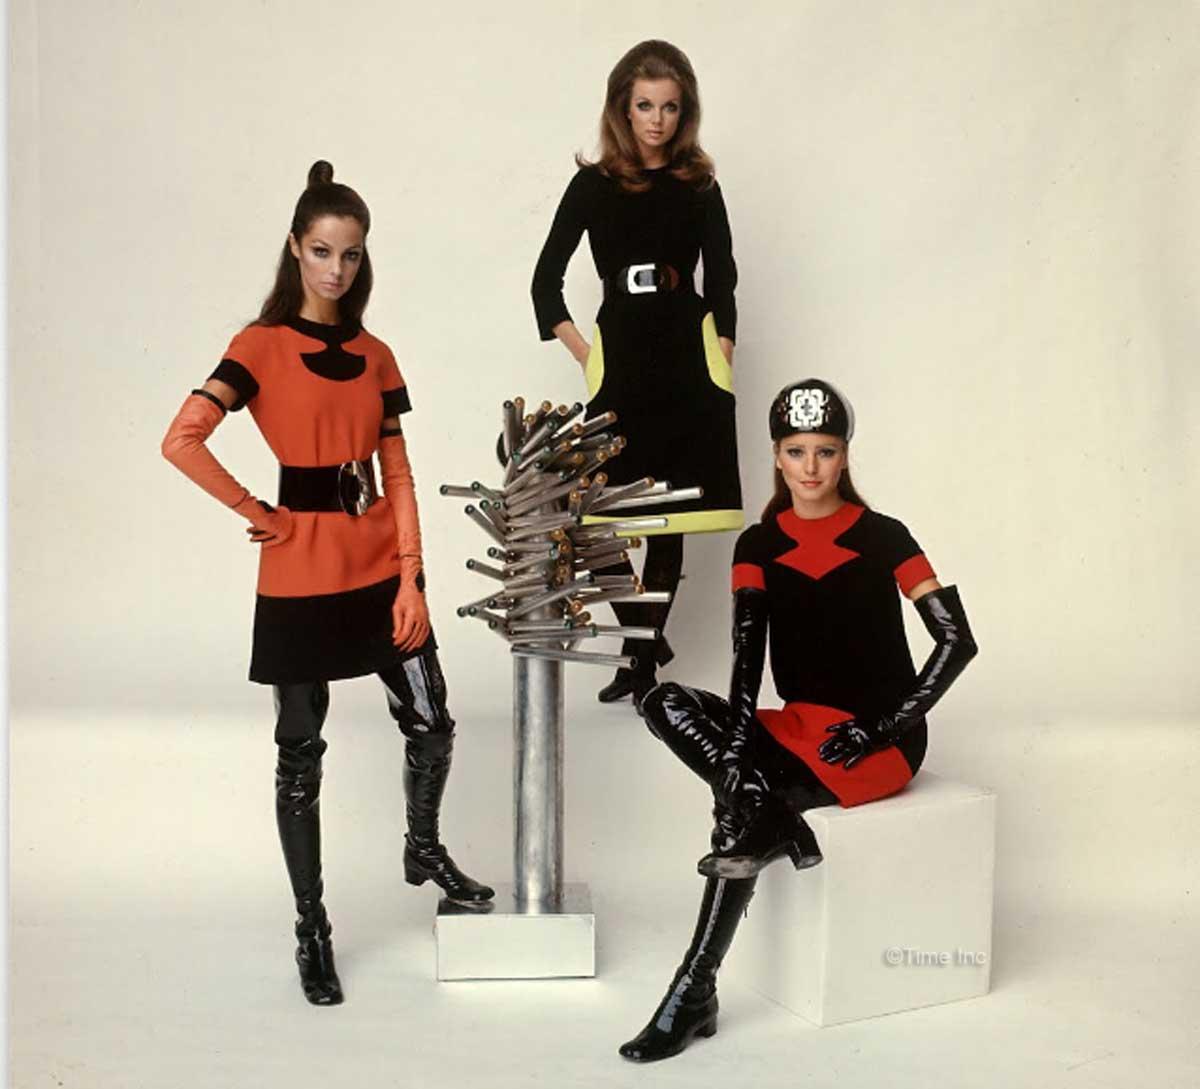 1960s-Fashion---Paris-Fall-Season-of-1968---Cardin